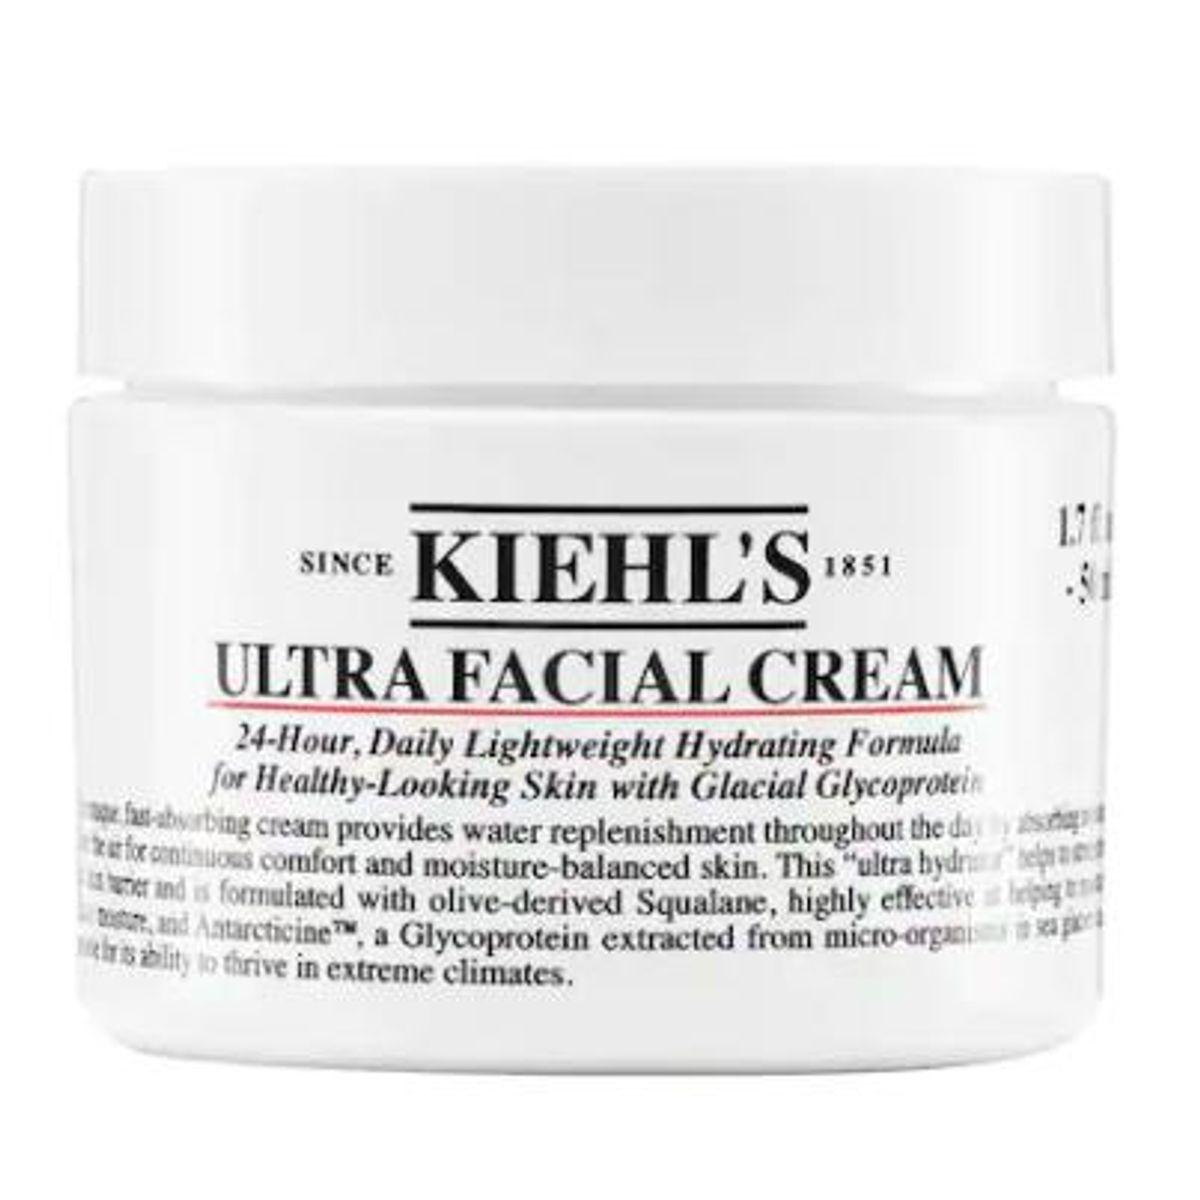 kiehls ultra facial moisturizing cream with squalane